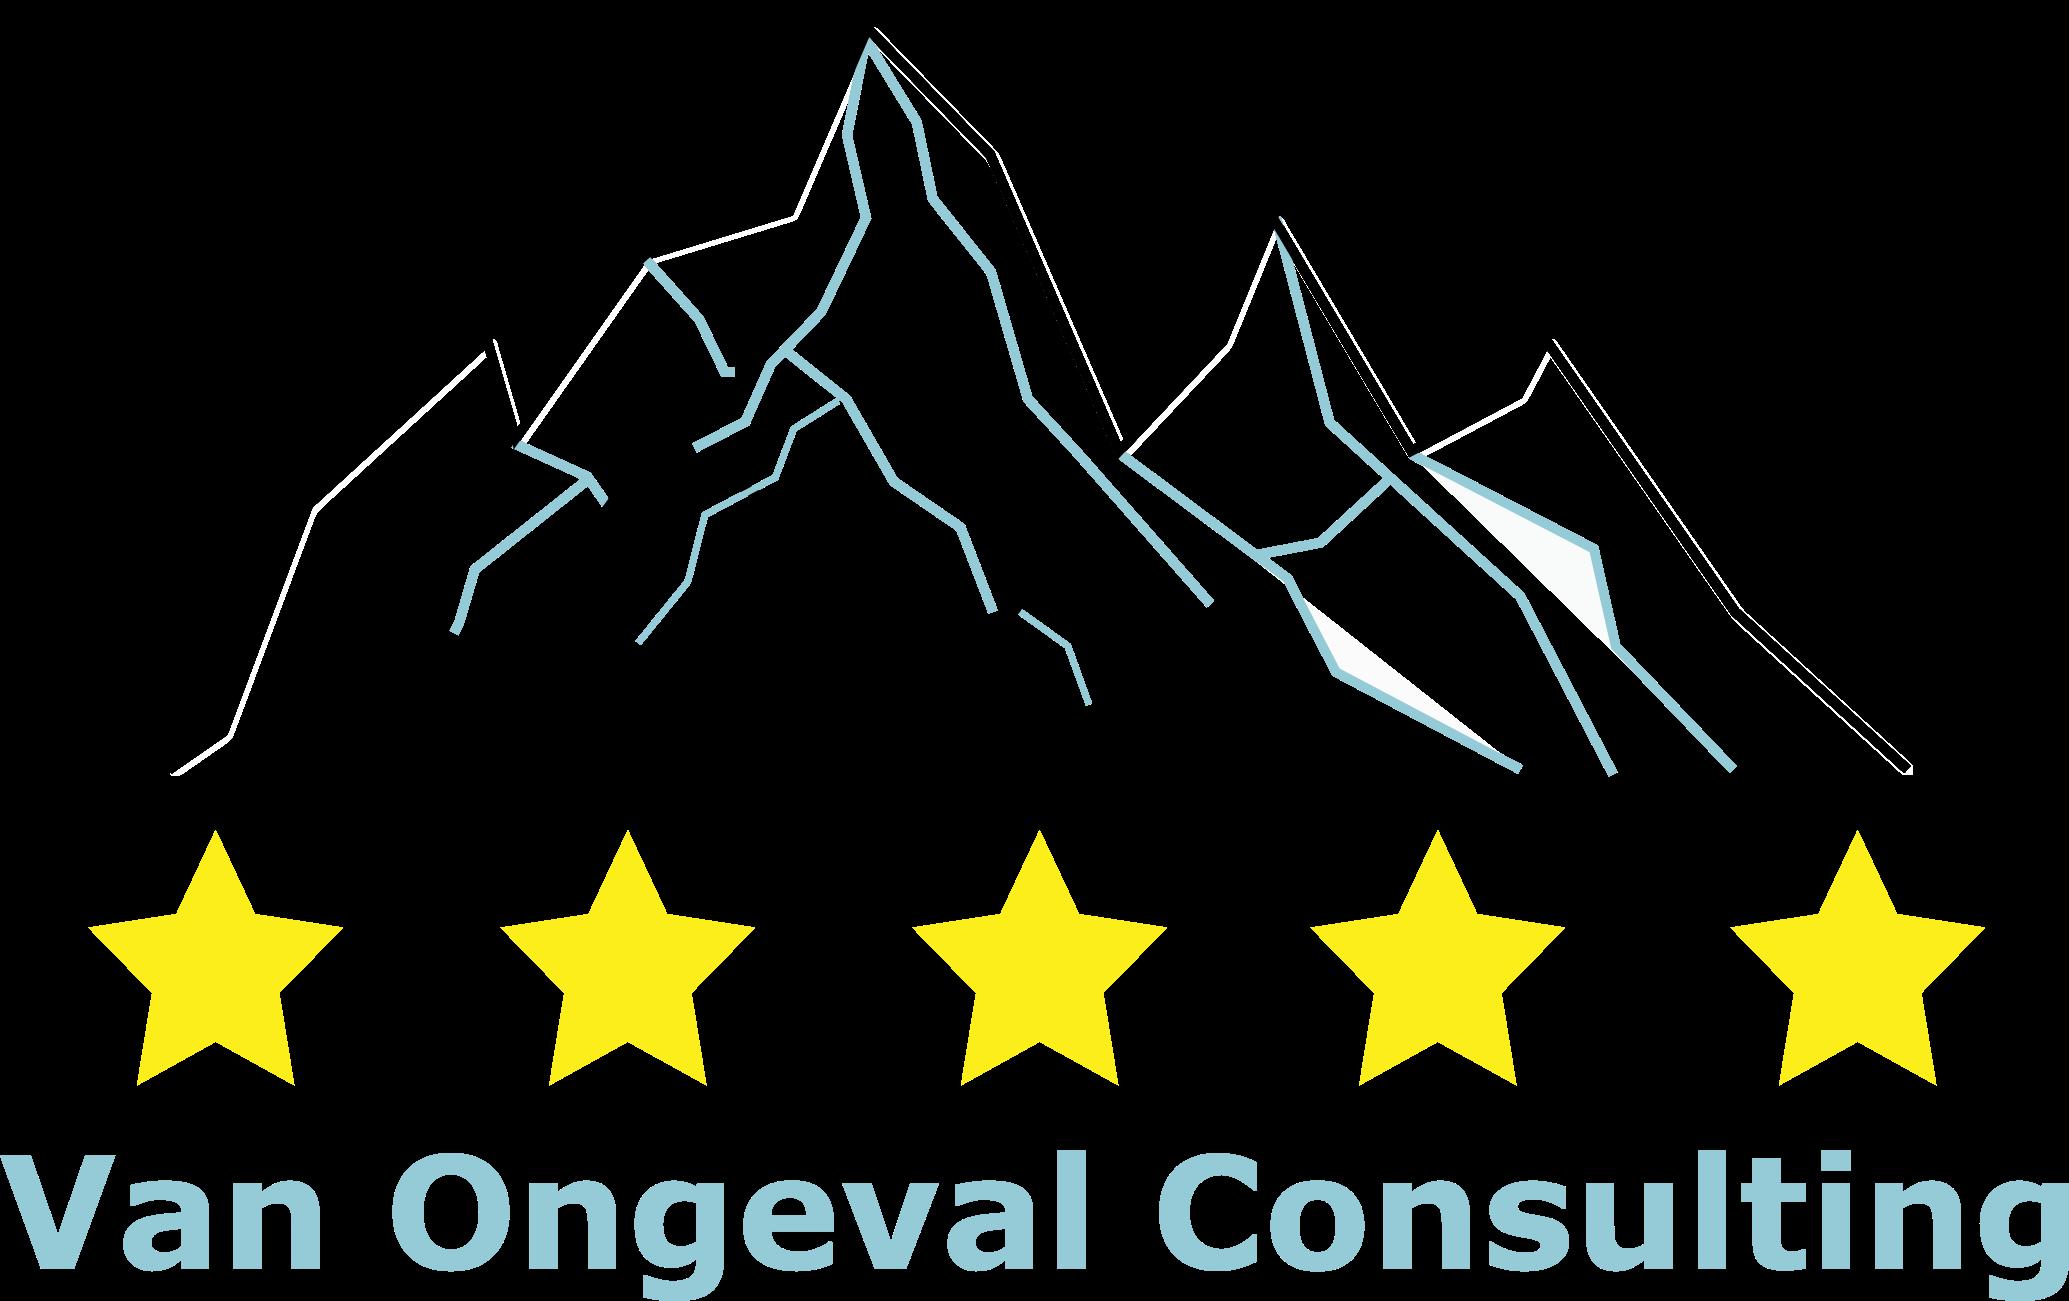 Van Ongeval Consulting